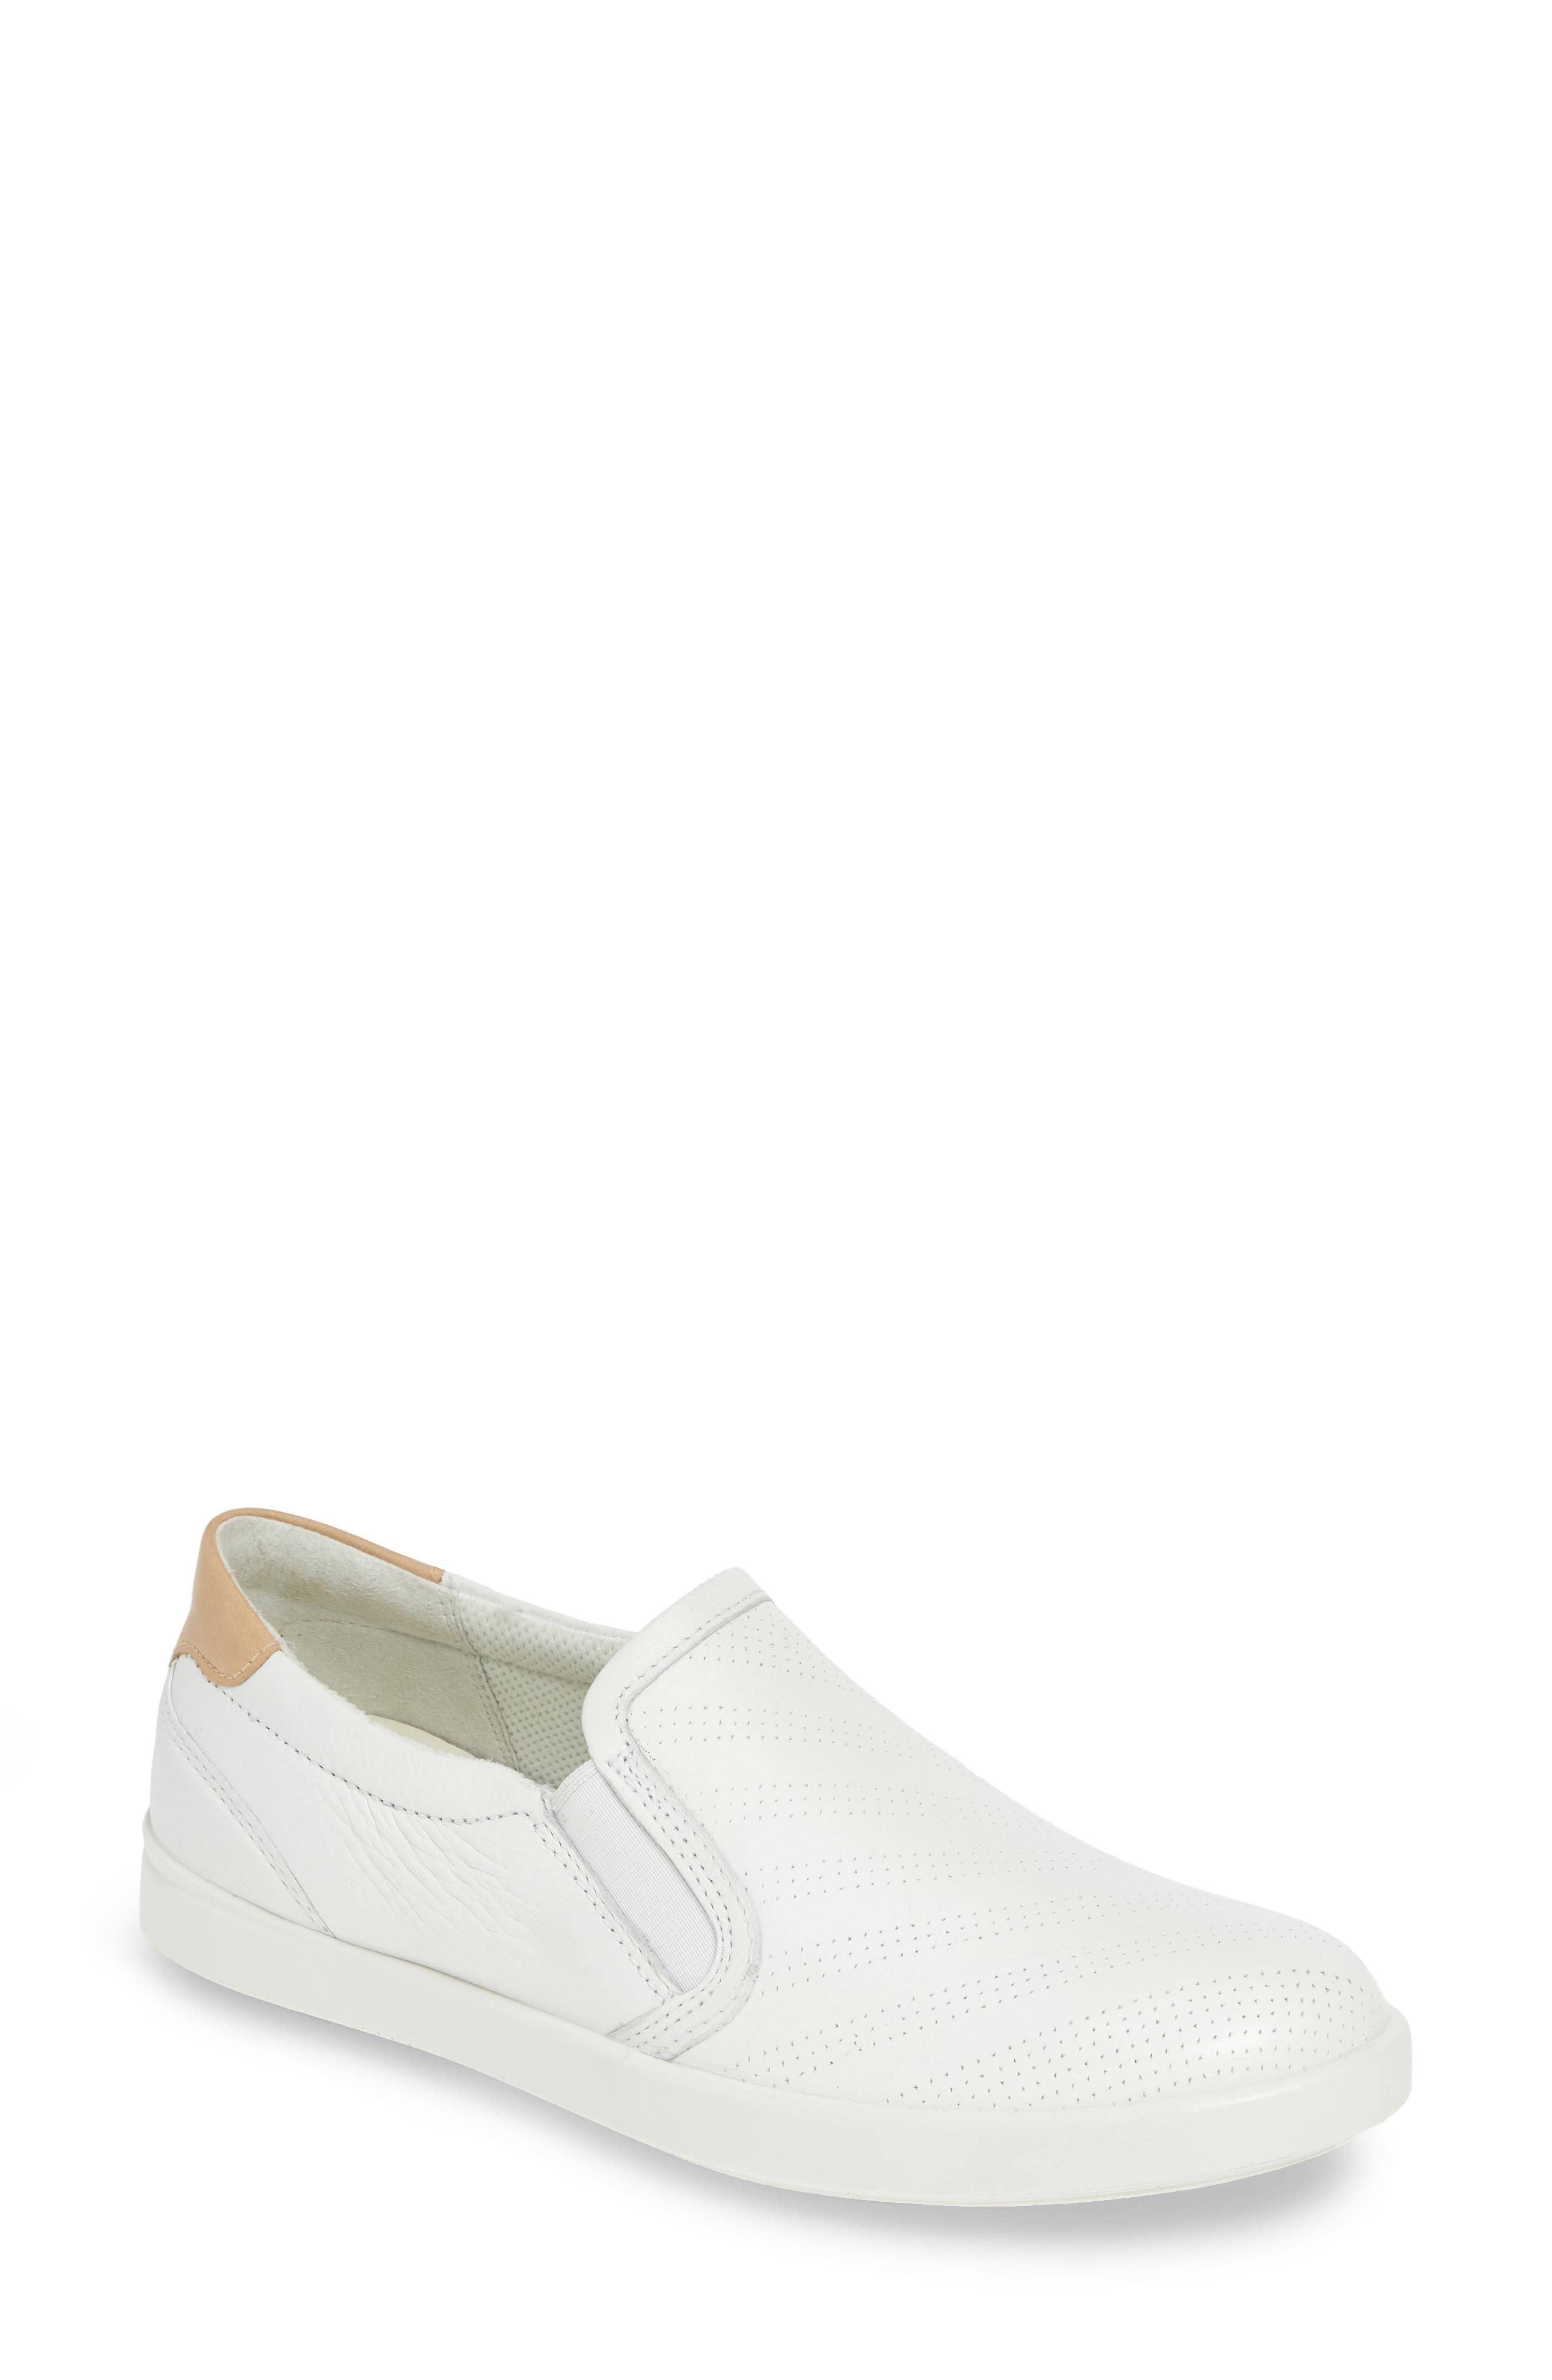 Ecco Leisure Slip-On Sneaker, White